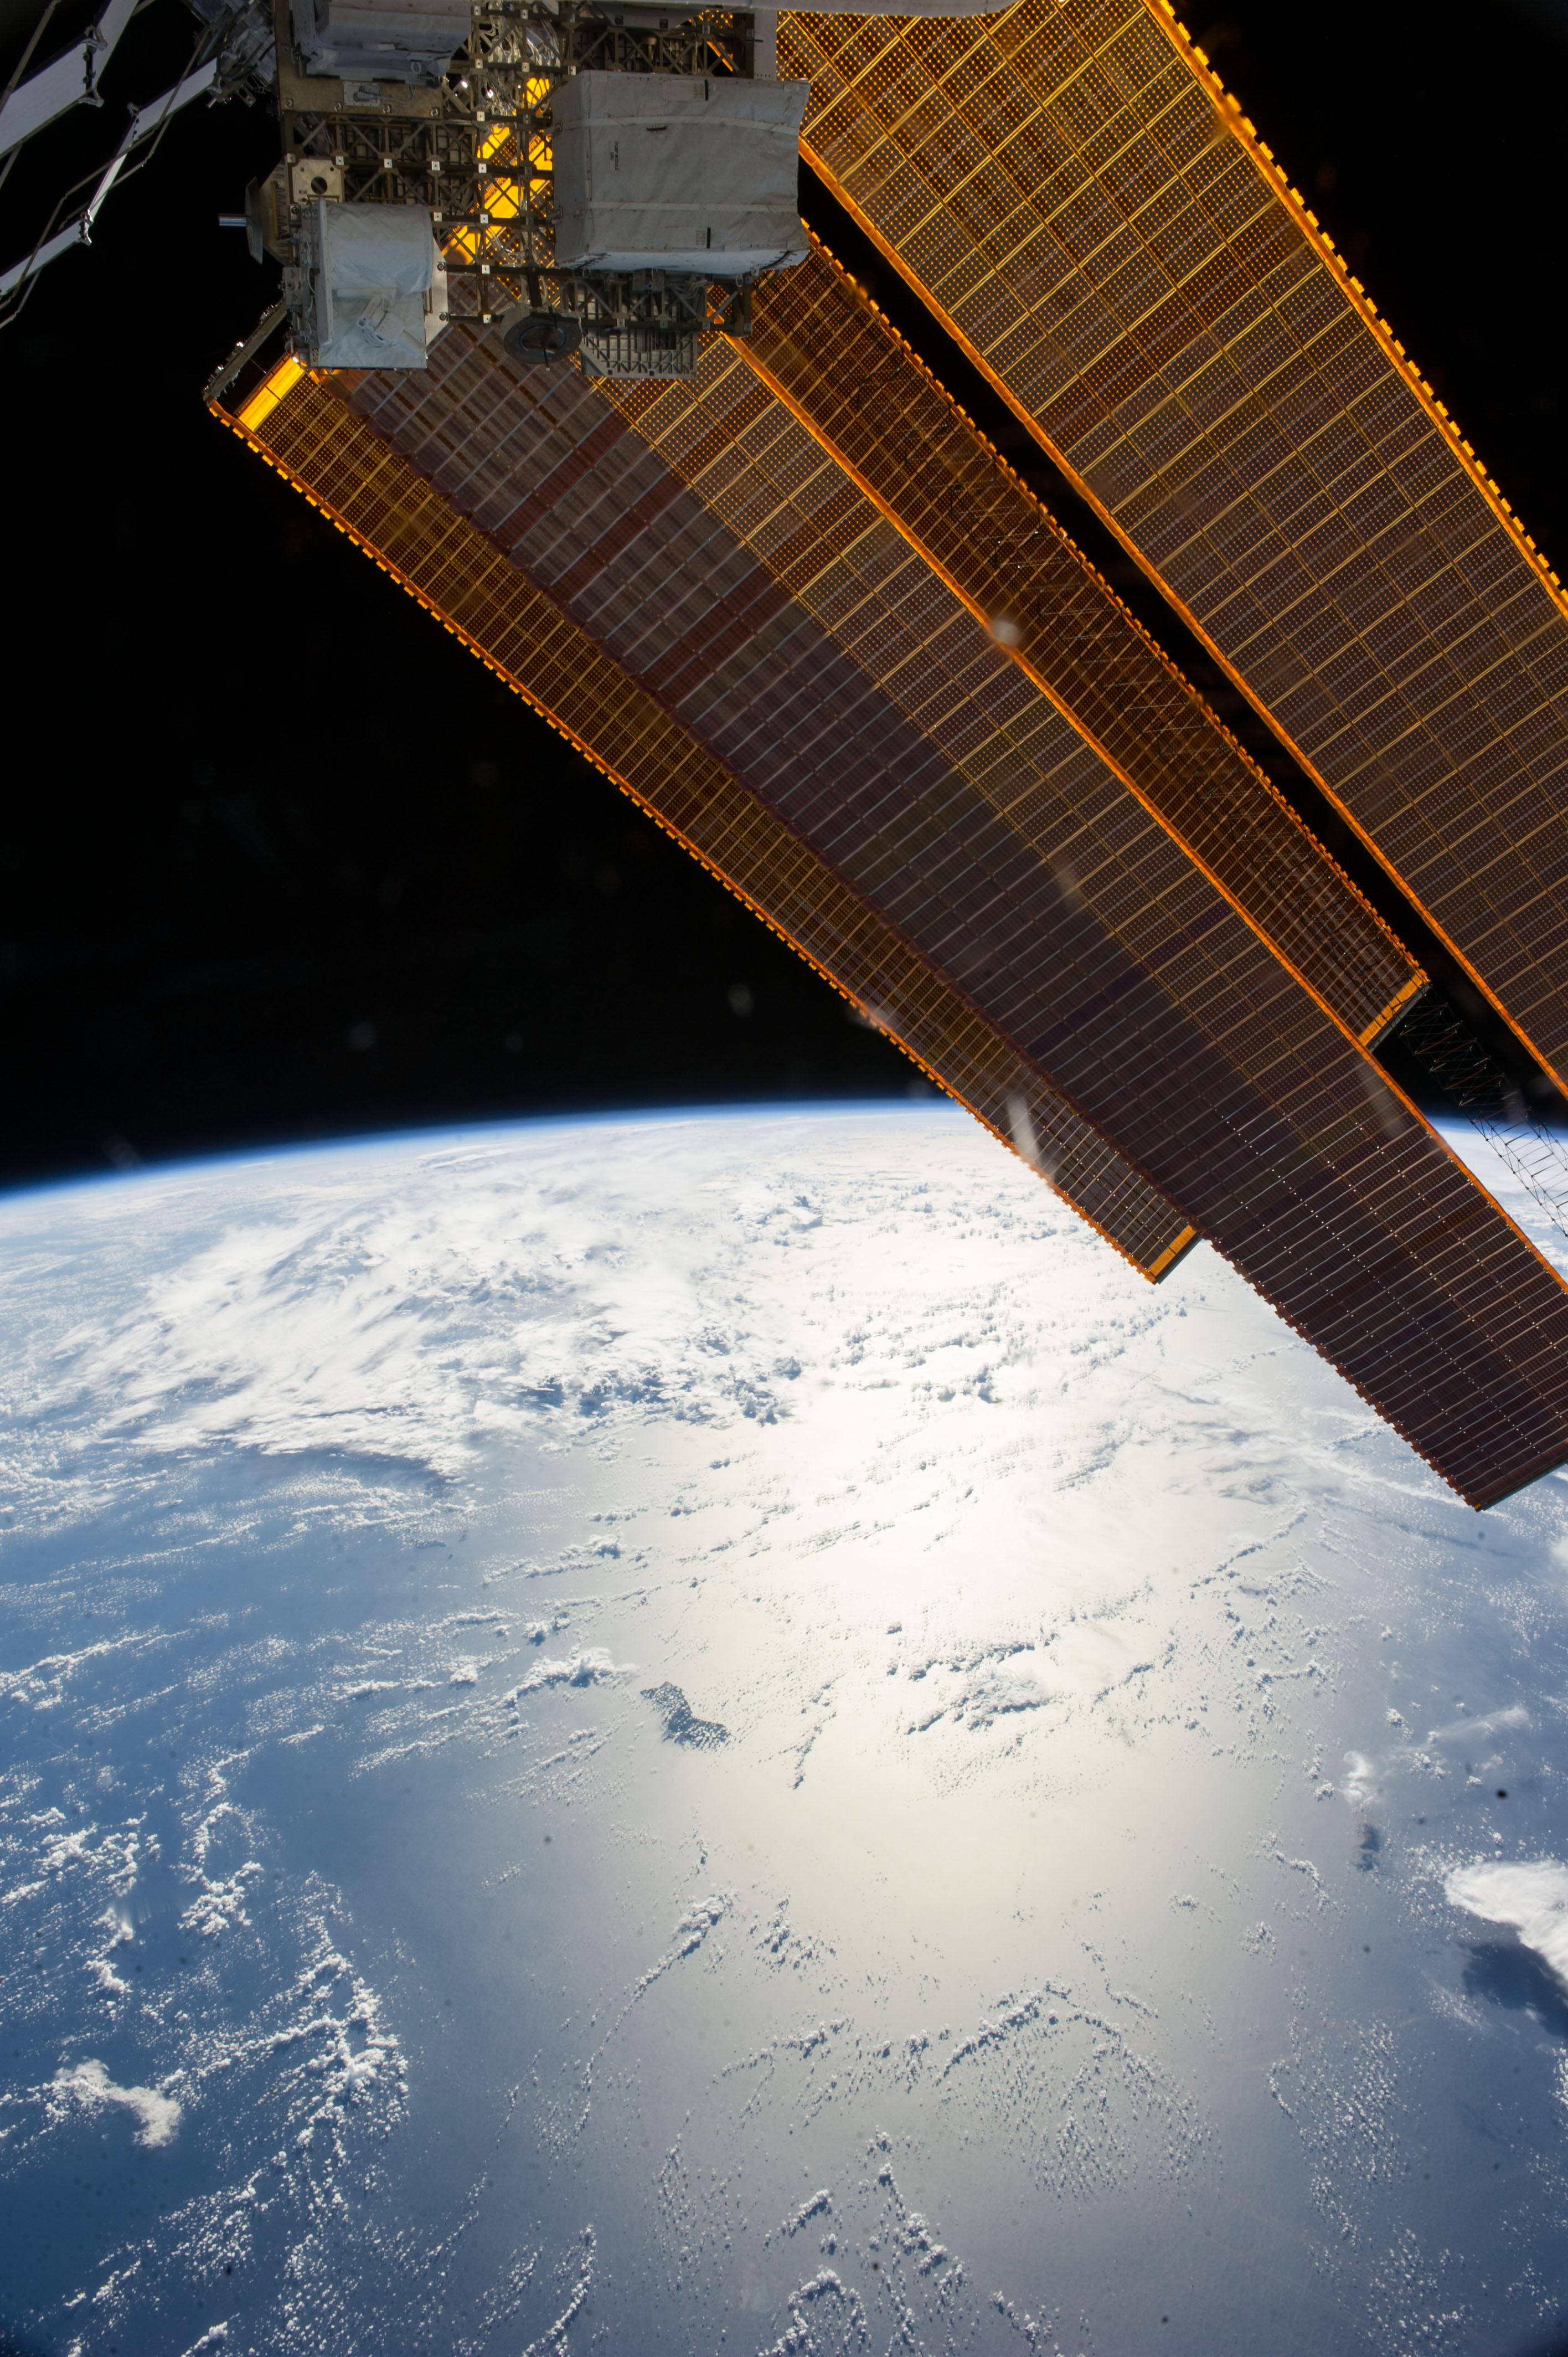 spacecraft solar array panels - photo #10